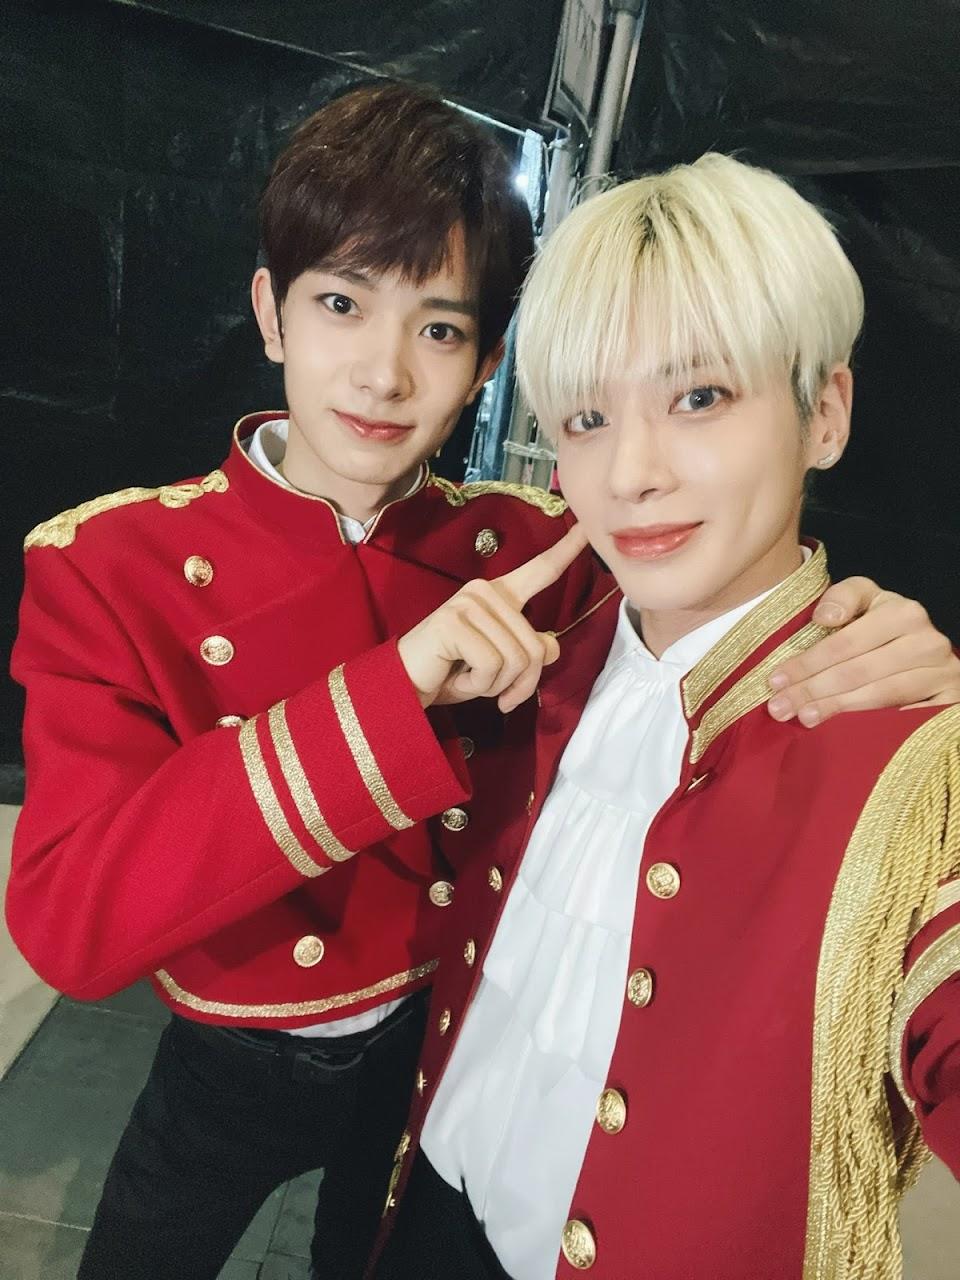 txt taehyun enhypen heeseung @ENHYPEN_members 3